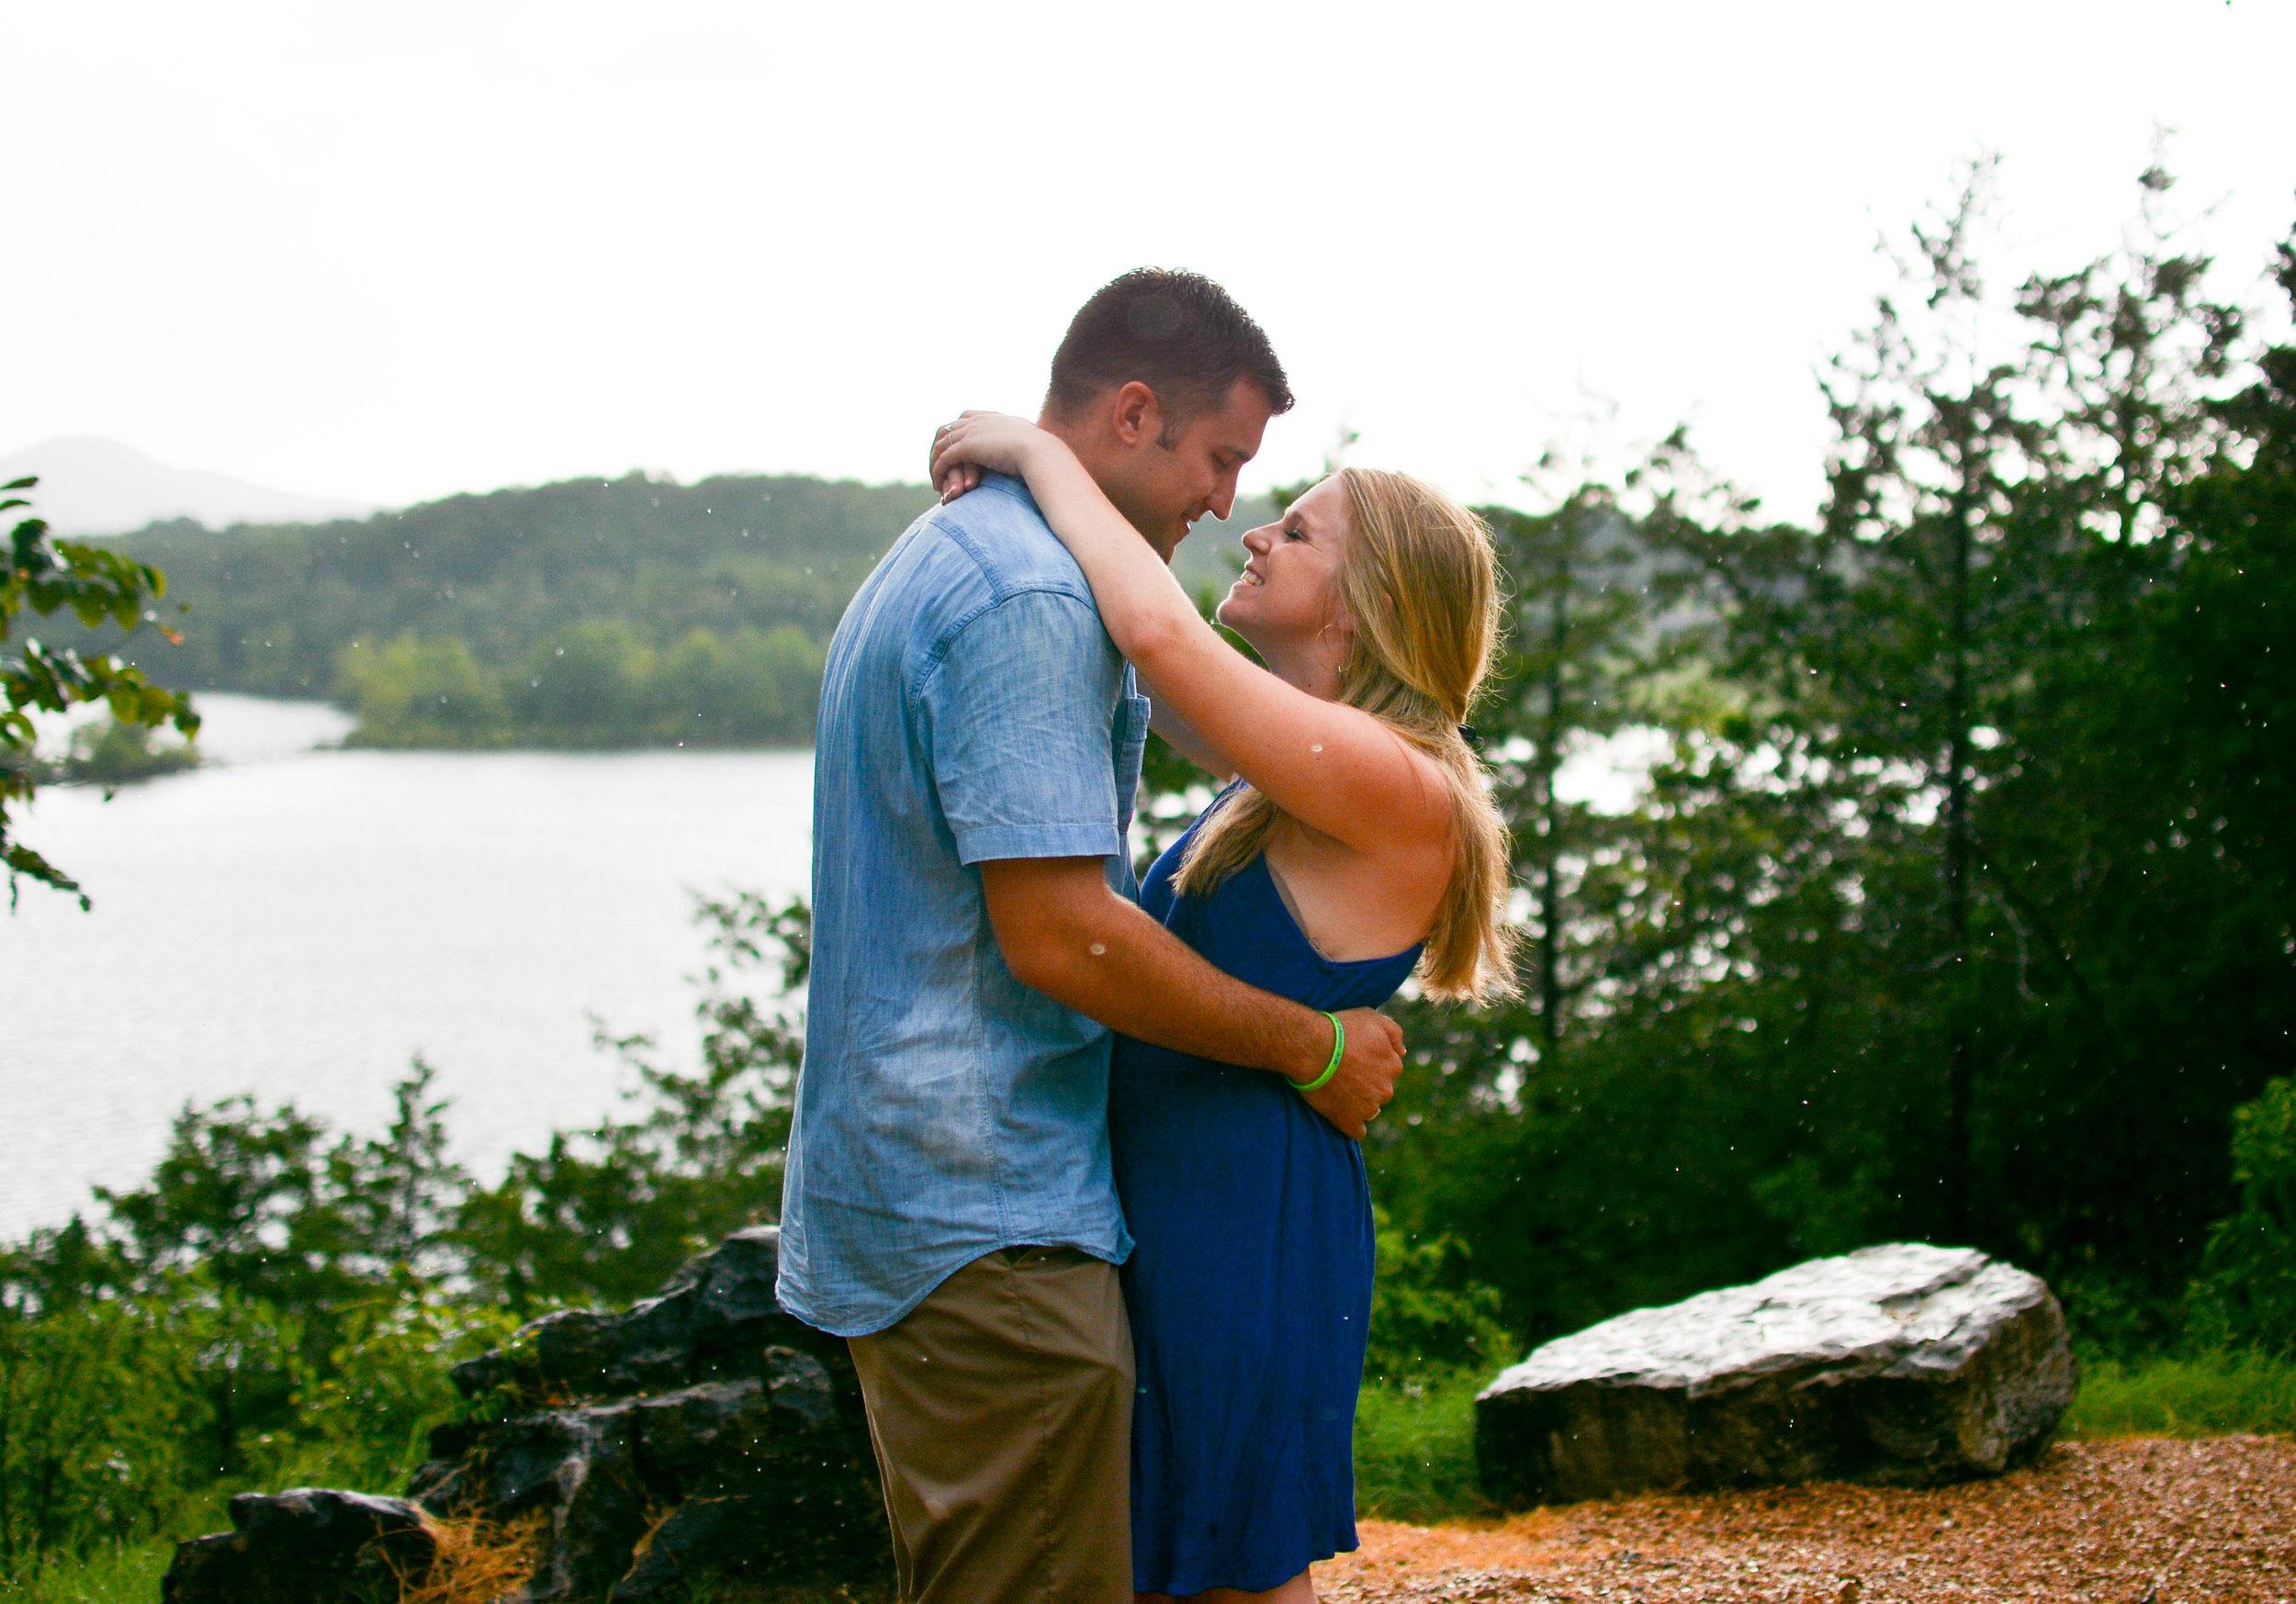 Beth + Bradley | Summer 2016 | Lookout Point | Proposal